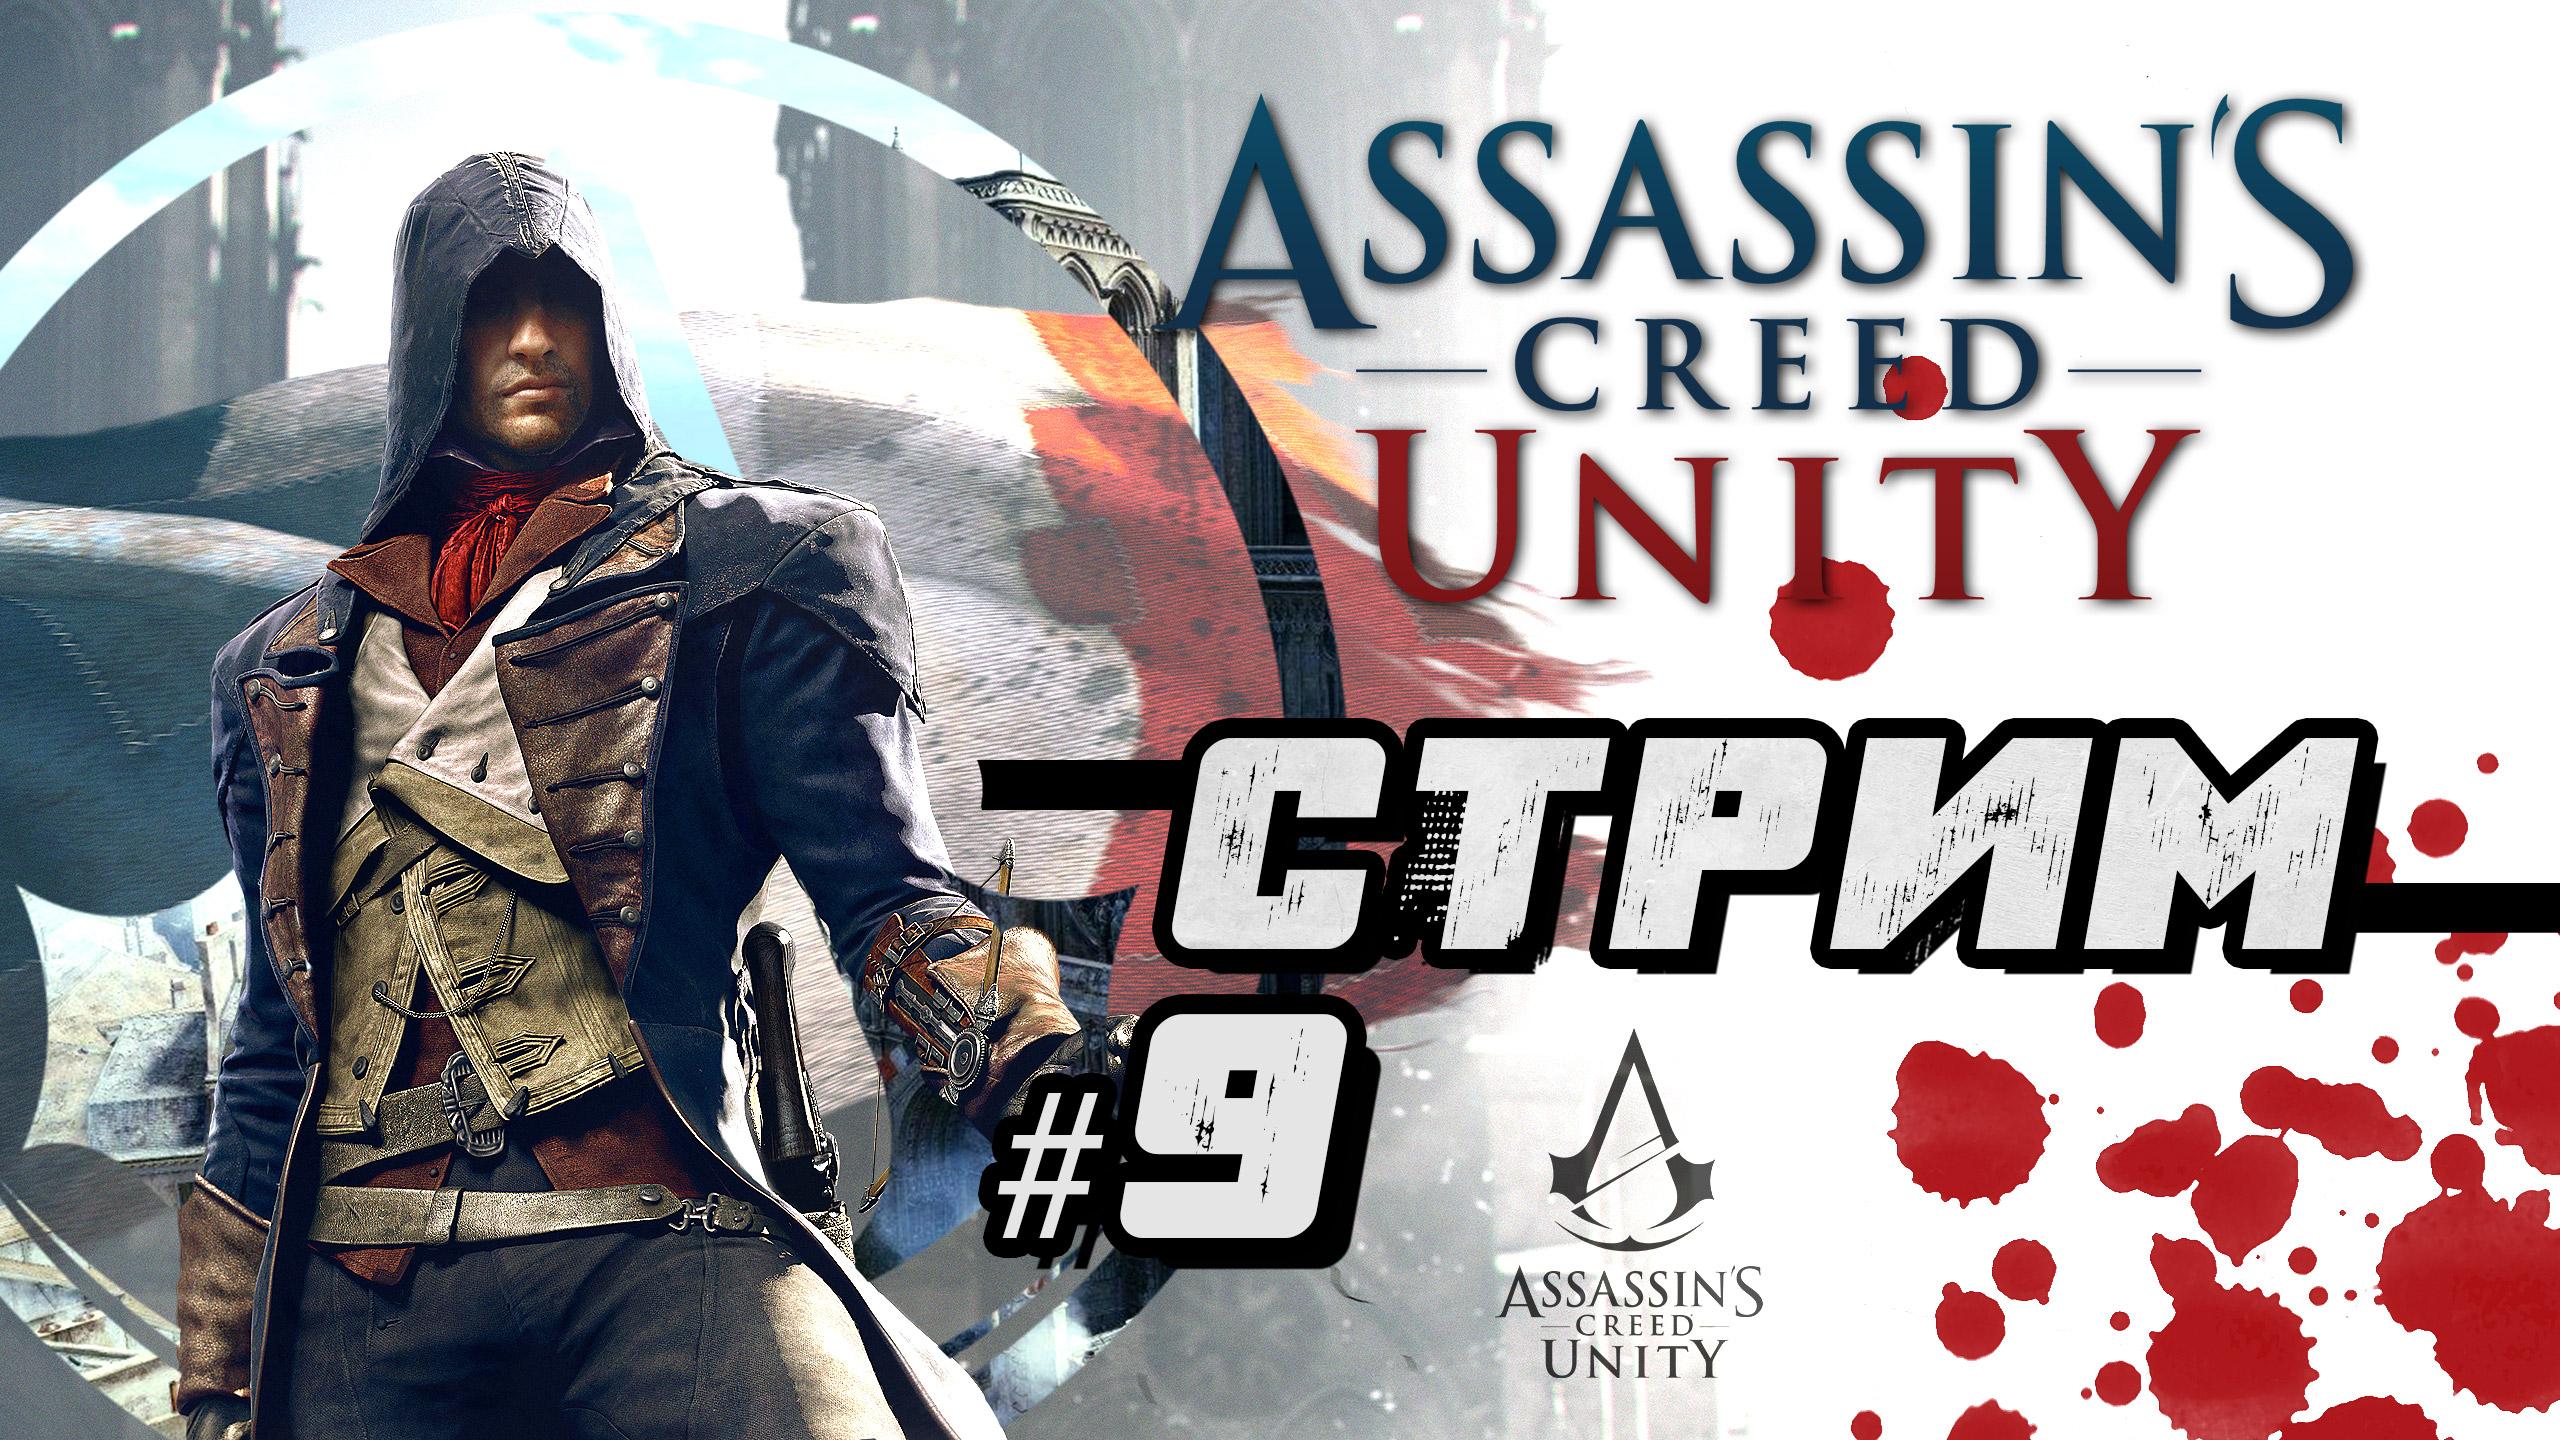 Assassins Creed Unity. Королевская переписка (Live, no comments #9)